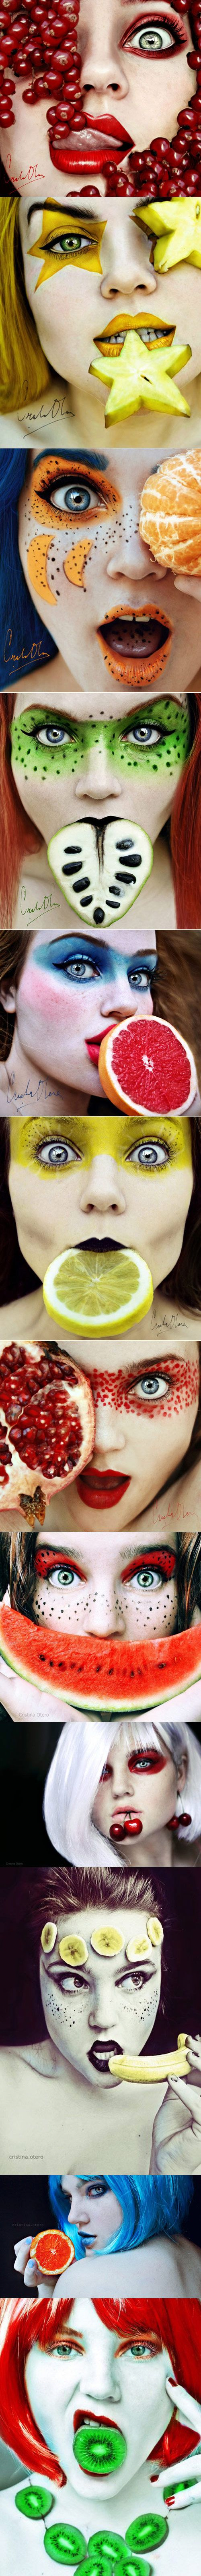 Tutti Frutti Self Portraits By Cristina Otero - #art #photography #portrait - www.boostinspirat...